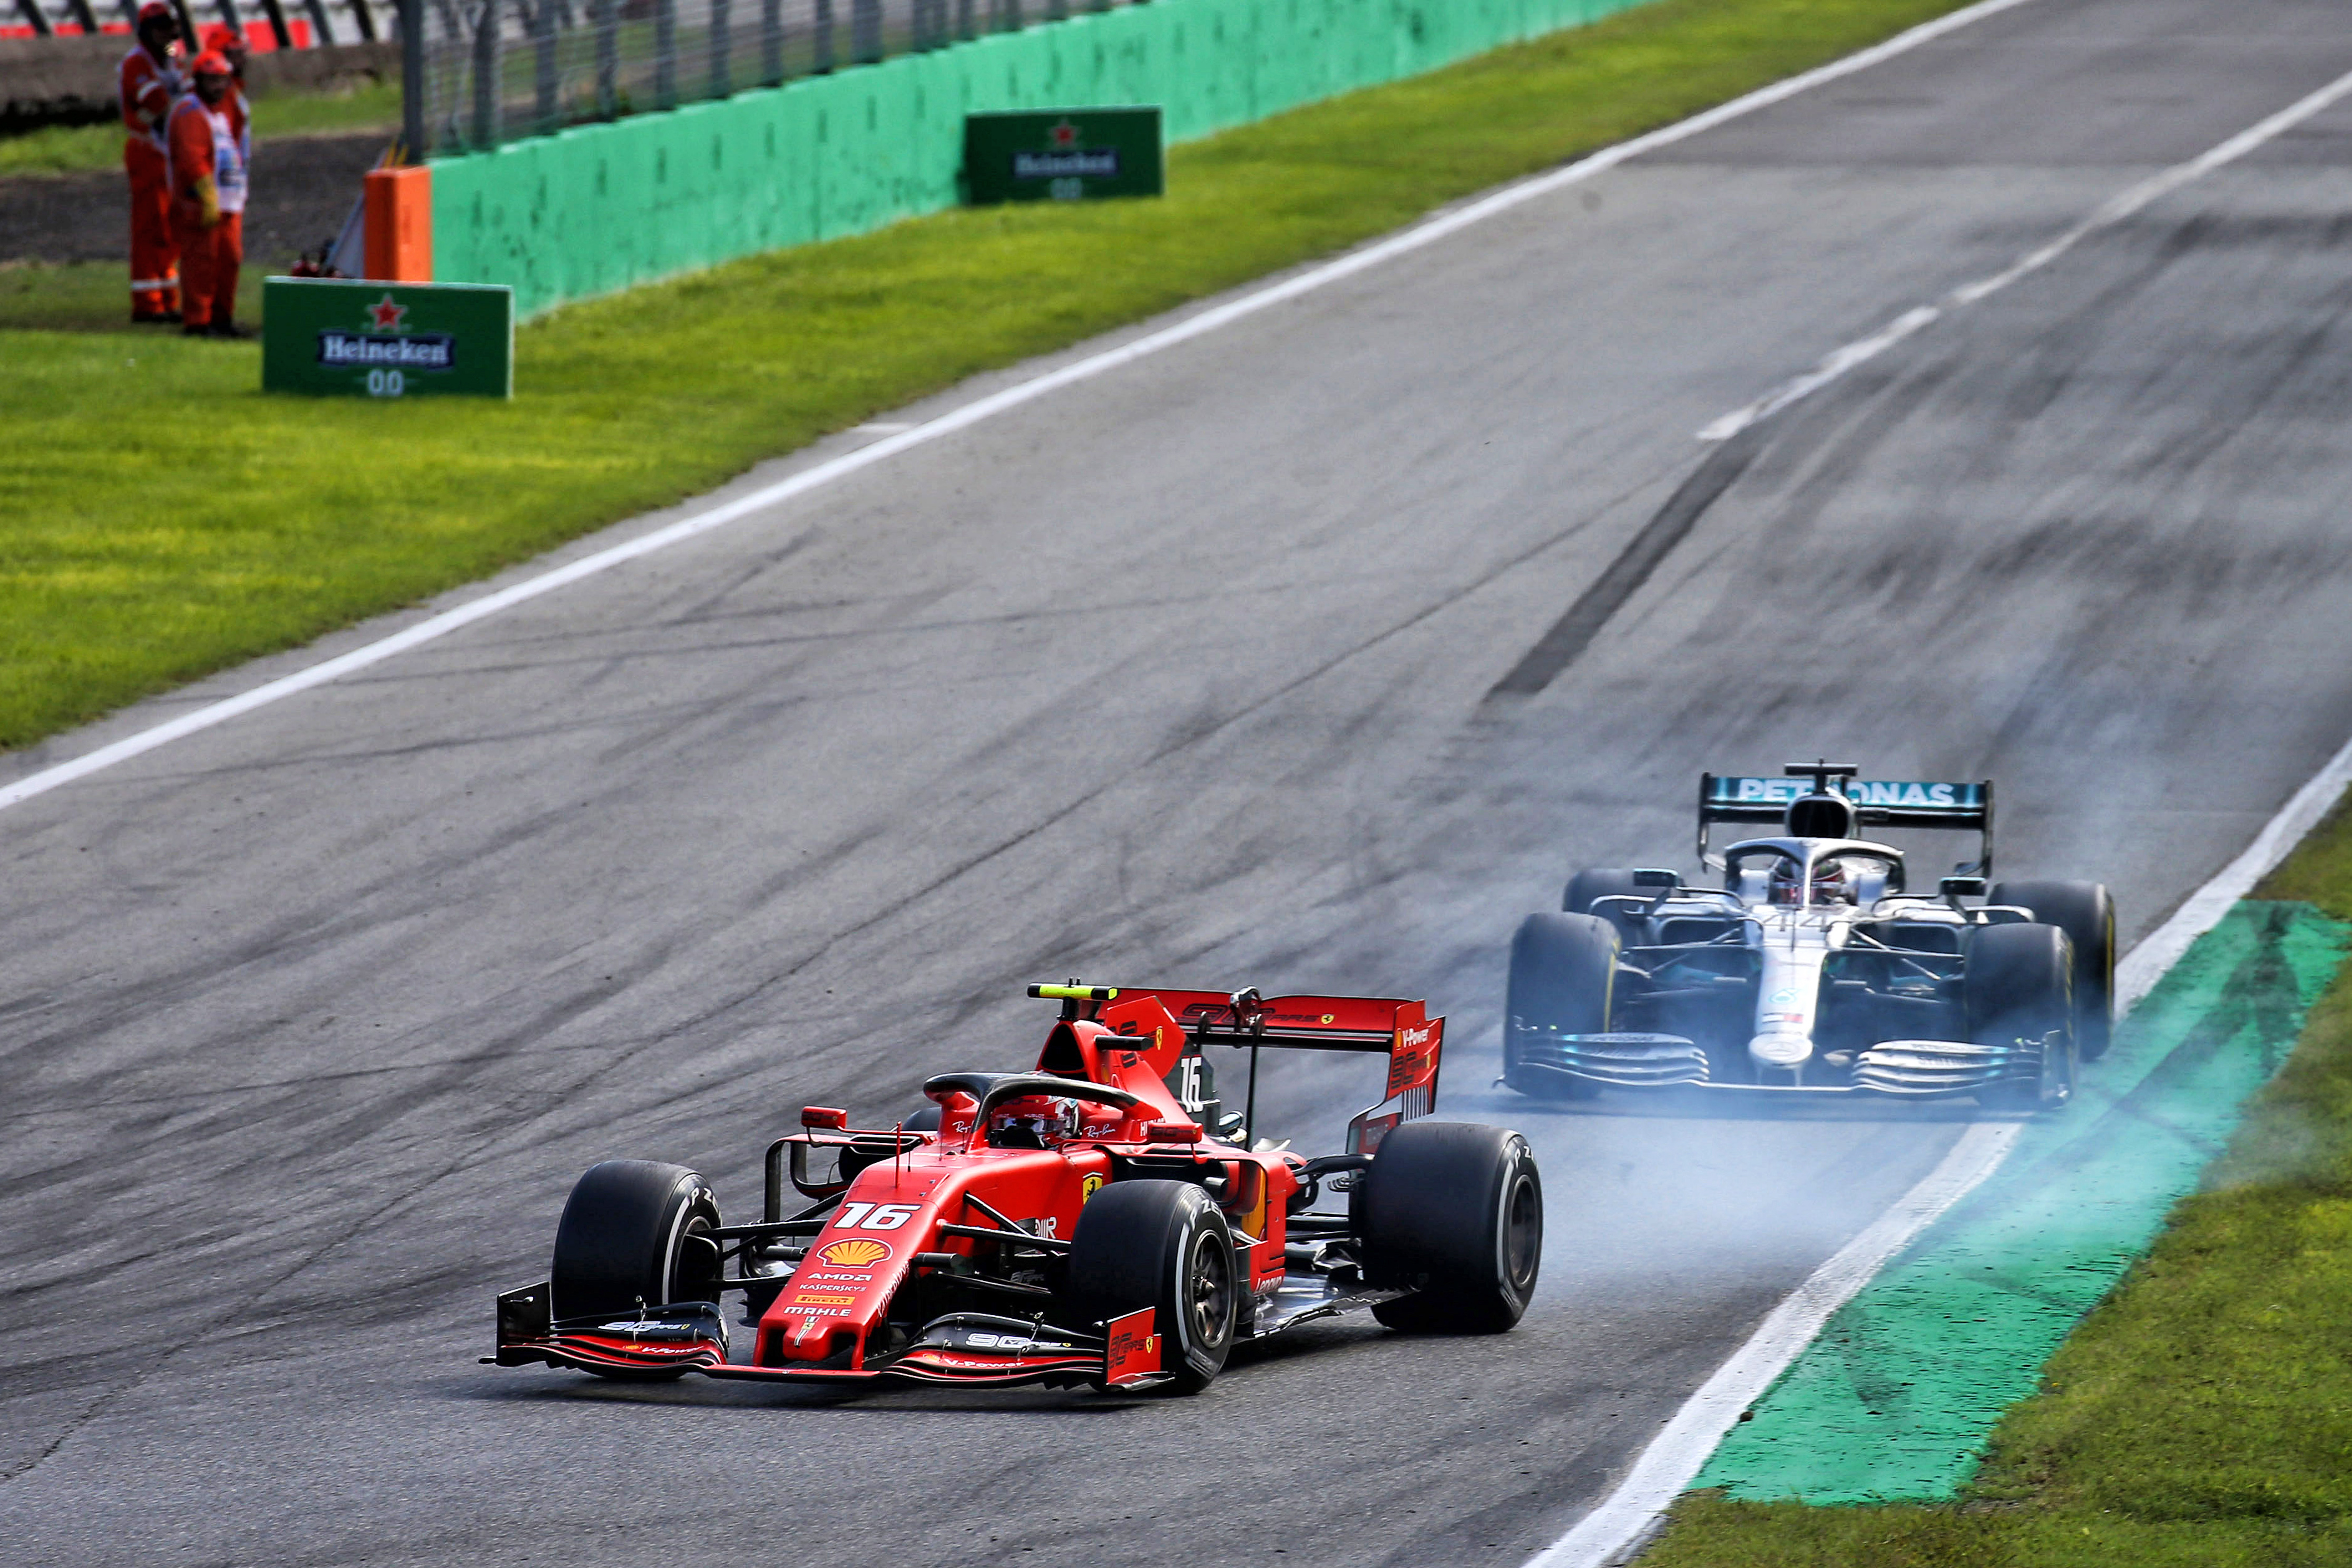 Charles Leclerc Ferrari Lewis Hamilton Mercedes Italian Grand Prix 2019 Monza